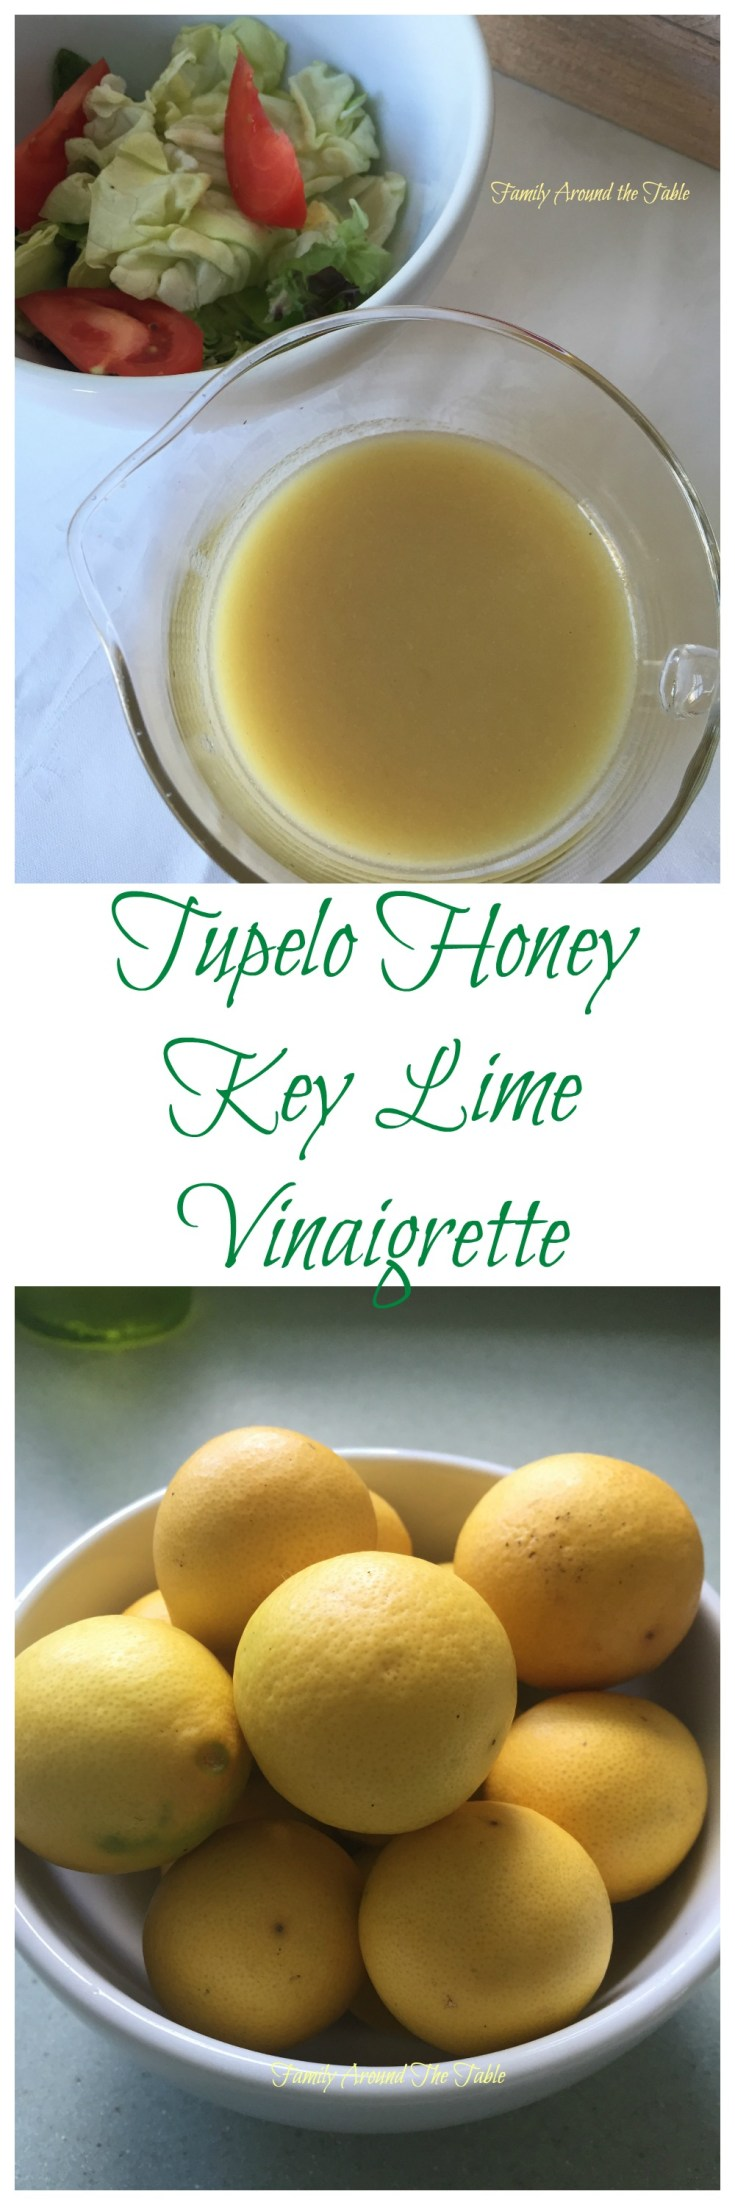 Tupelo Honey Key Lime Vinaigrette is a flavorful salad dressing or marinade.